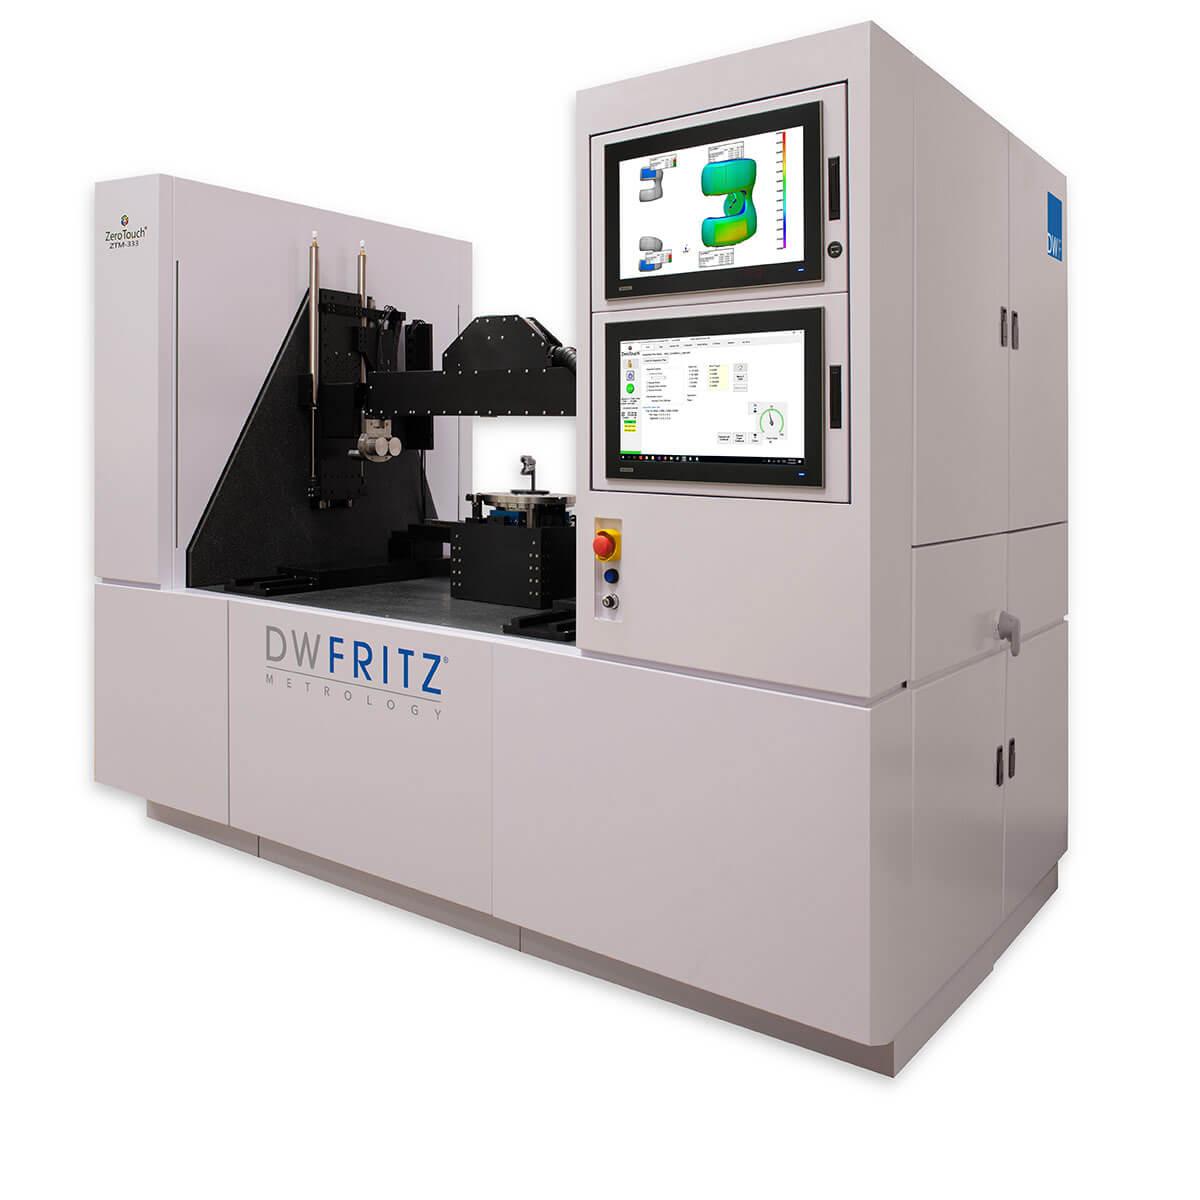 DW Fritz Zero touch Automated Non-Contact Measurement